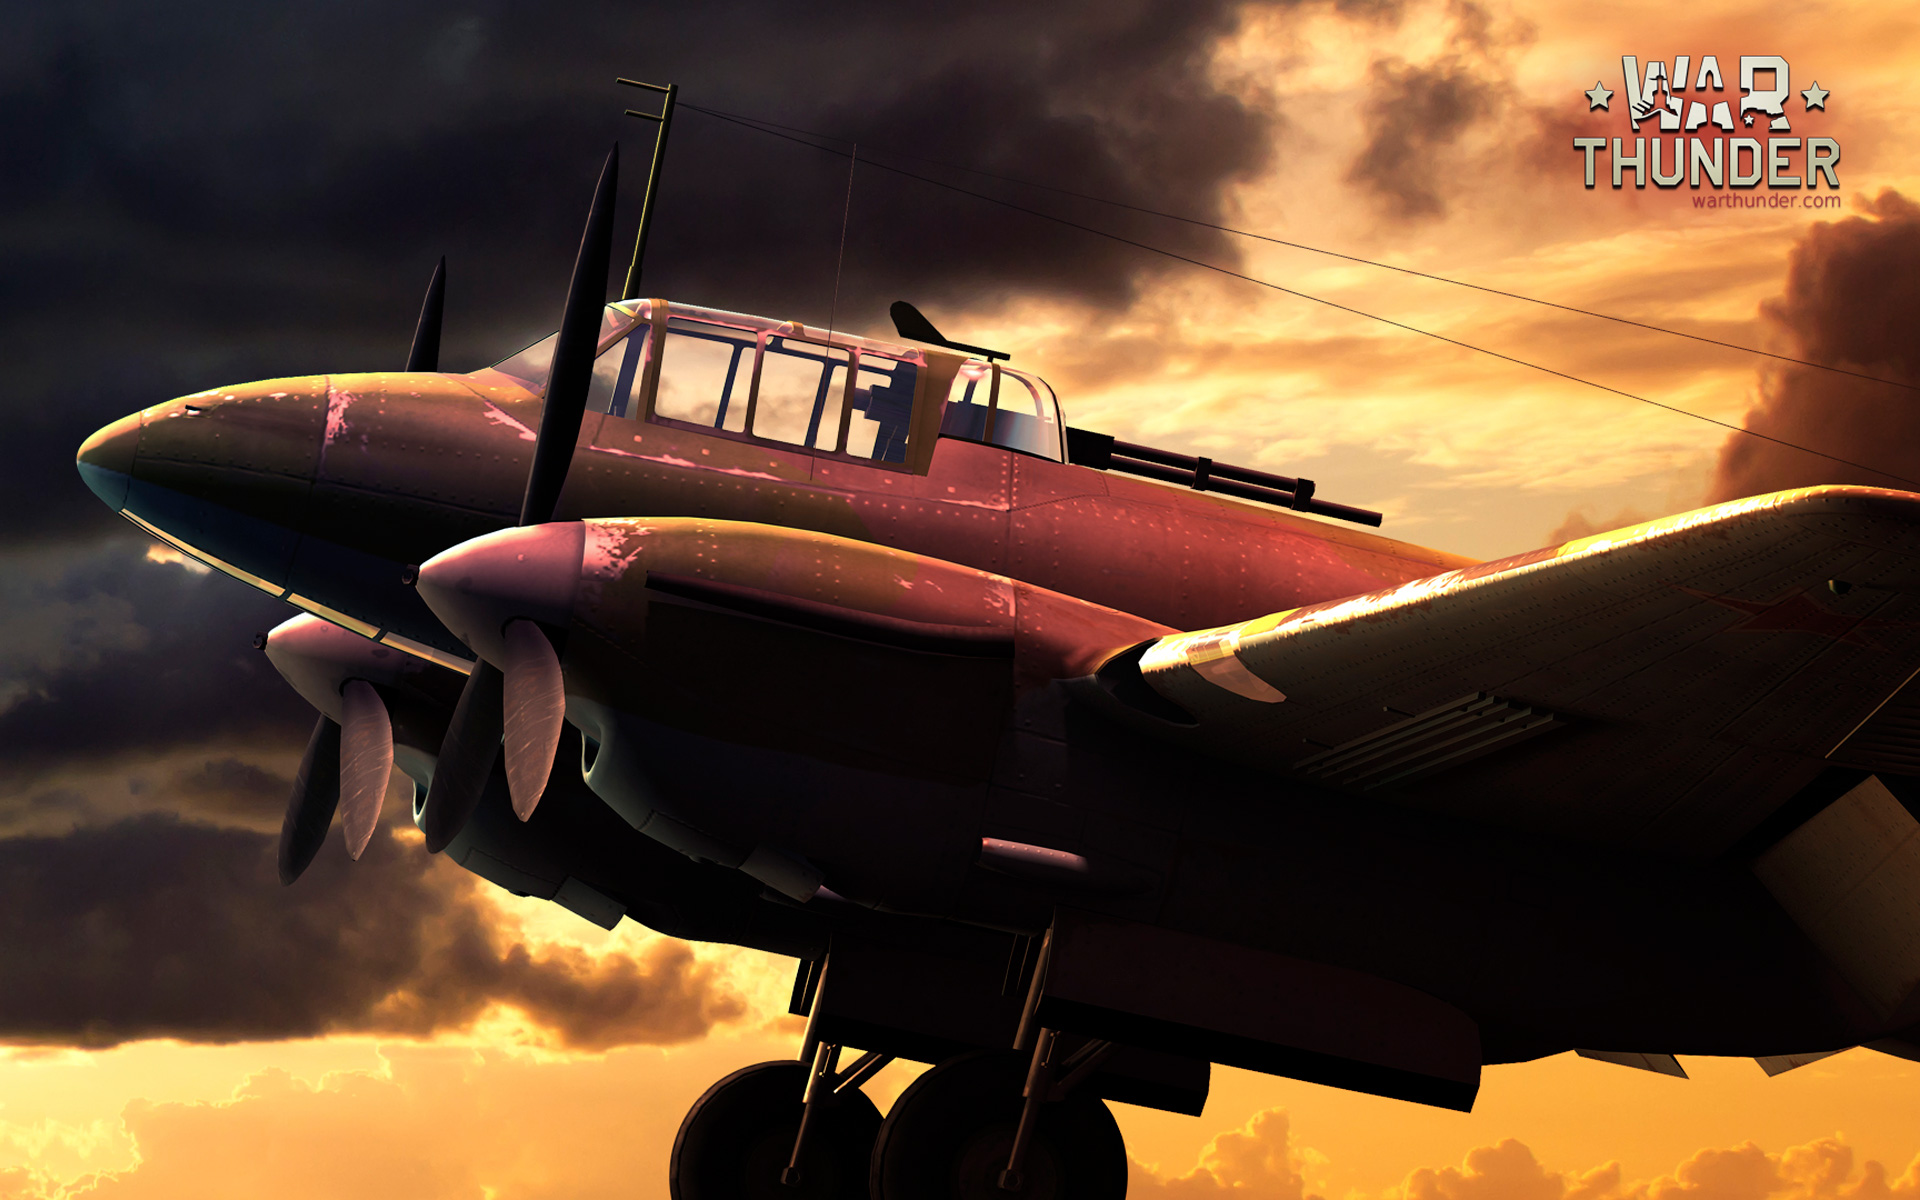 Free War Thunder Wallpaper in 1920x1200